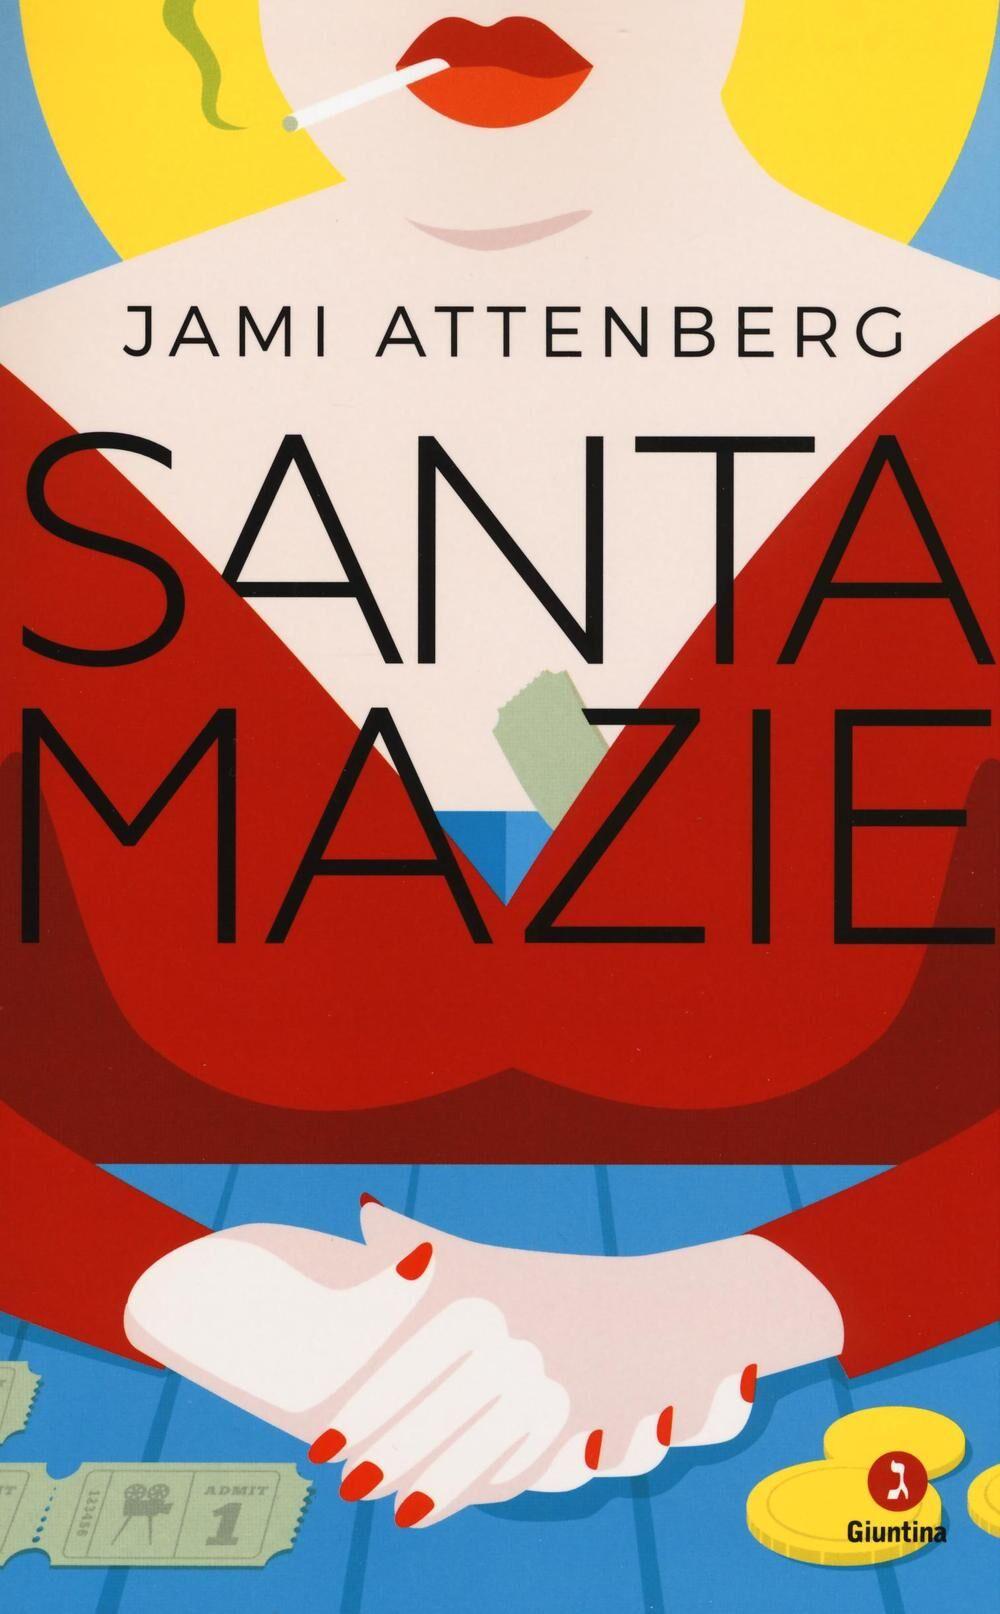 Santa Mazie